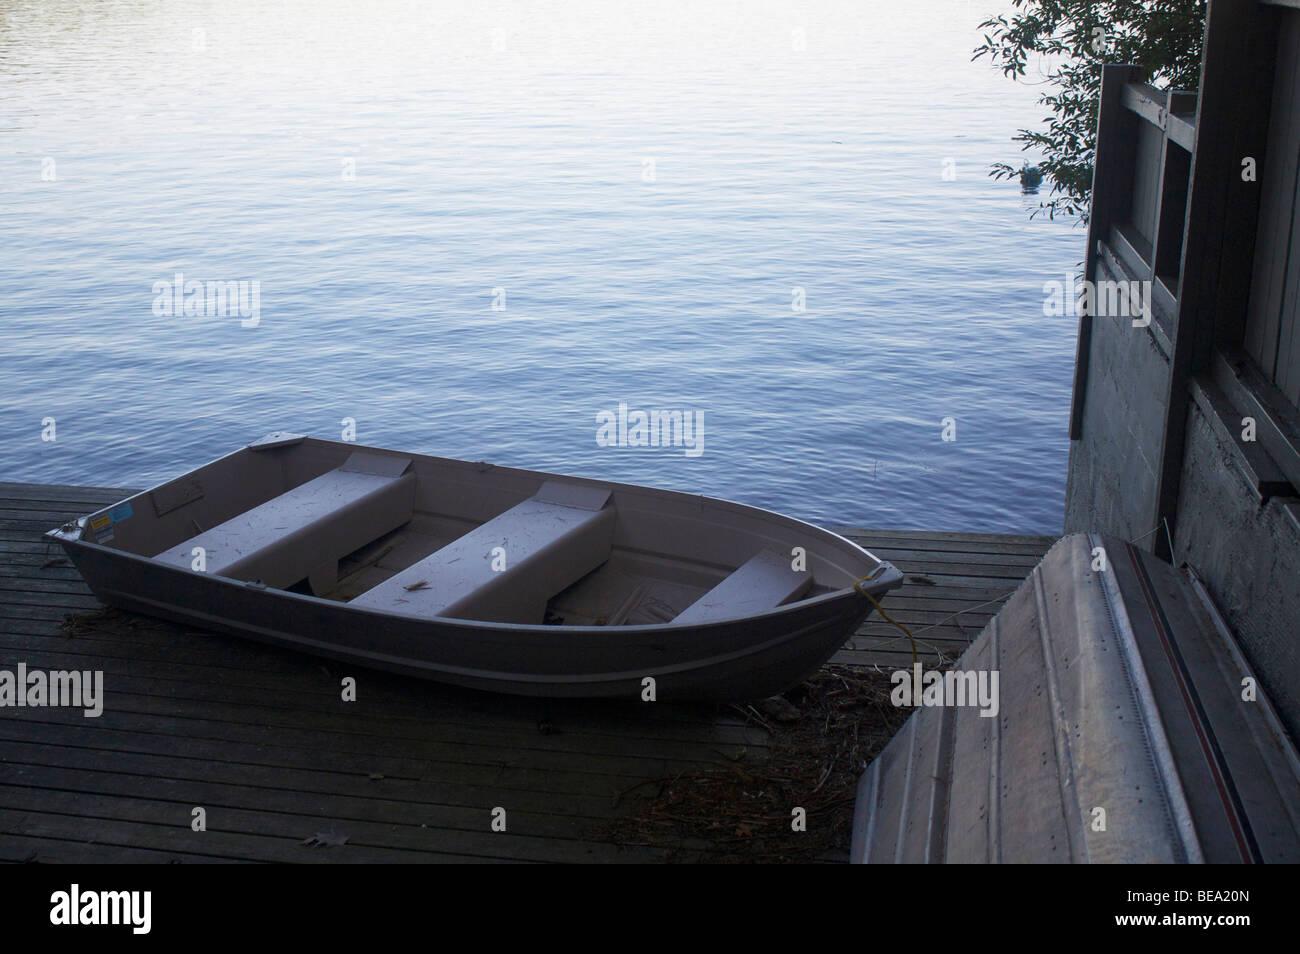 Row boats docked by a lake - Stock Image